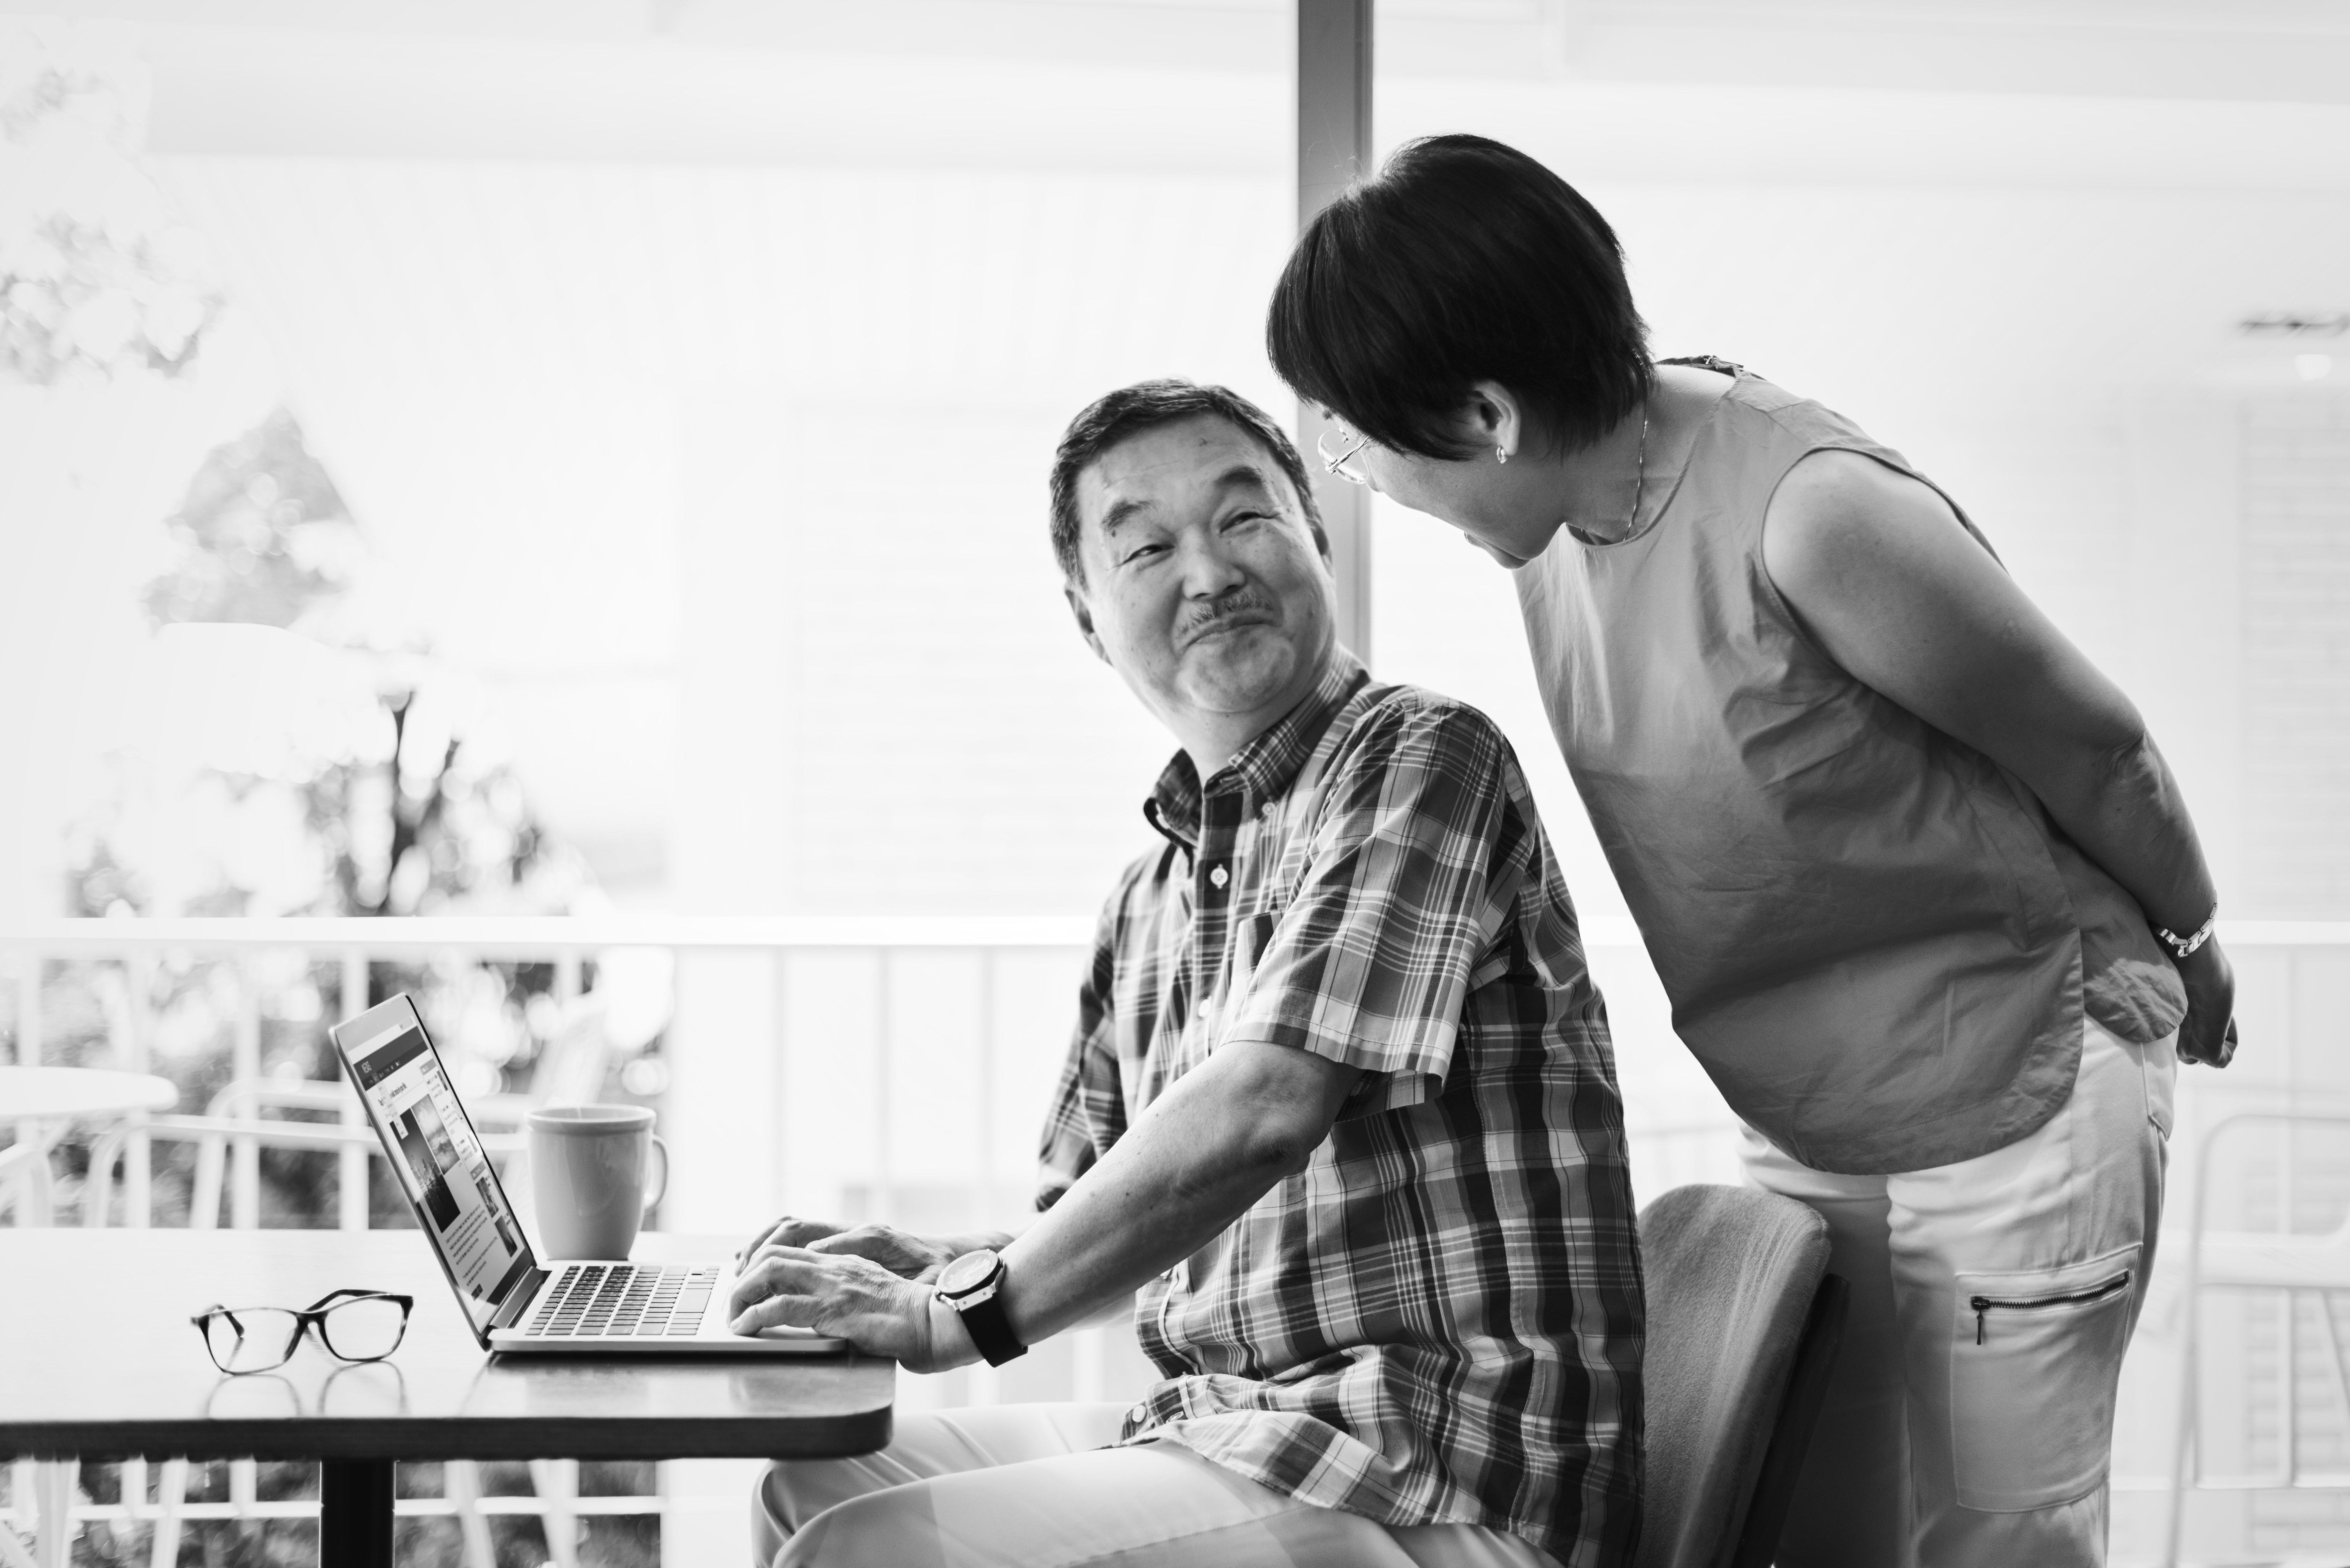 asian-senior-couple-at-home-XMUW7AH